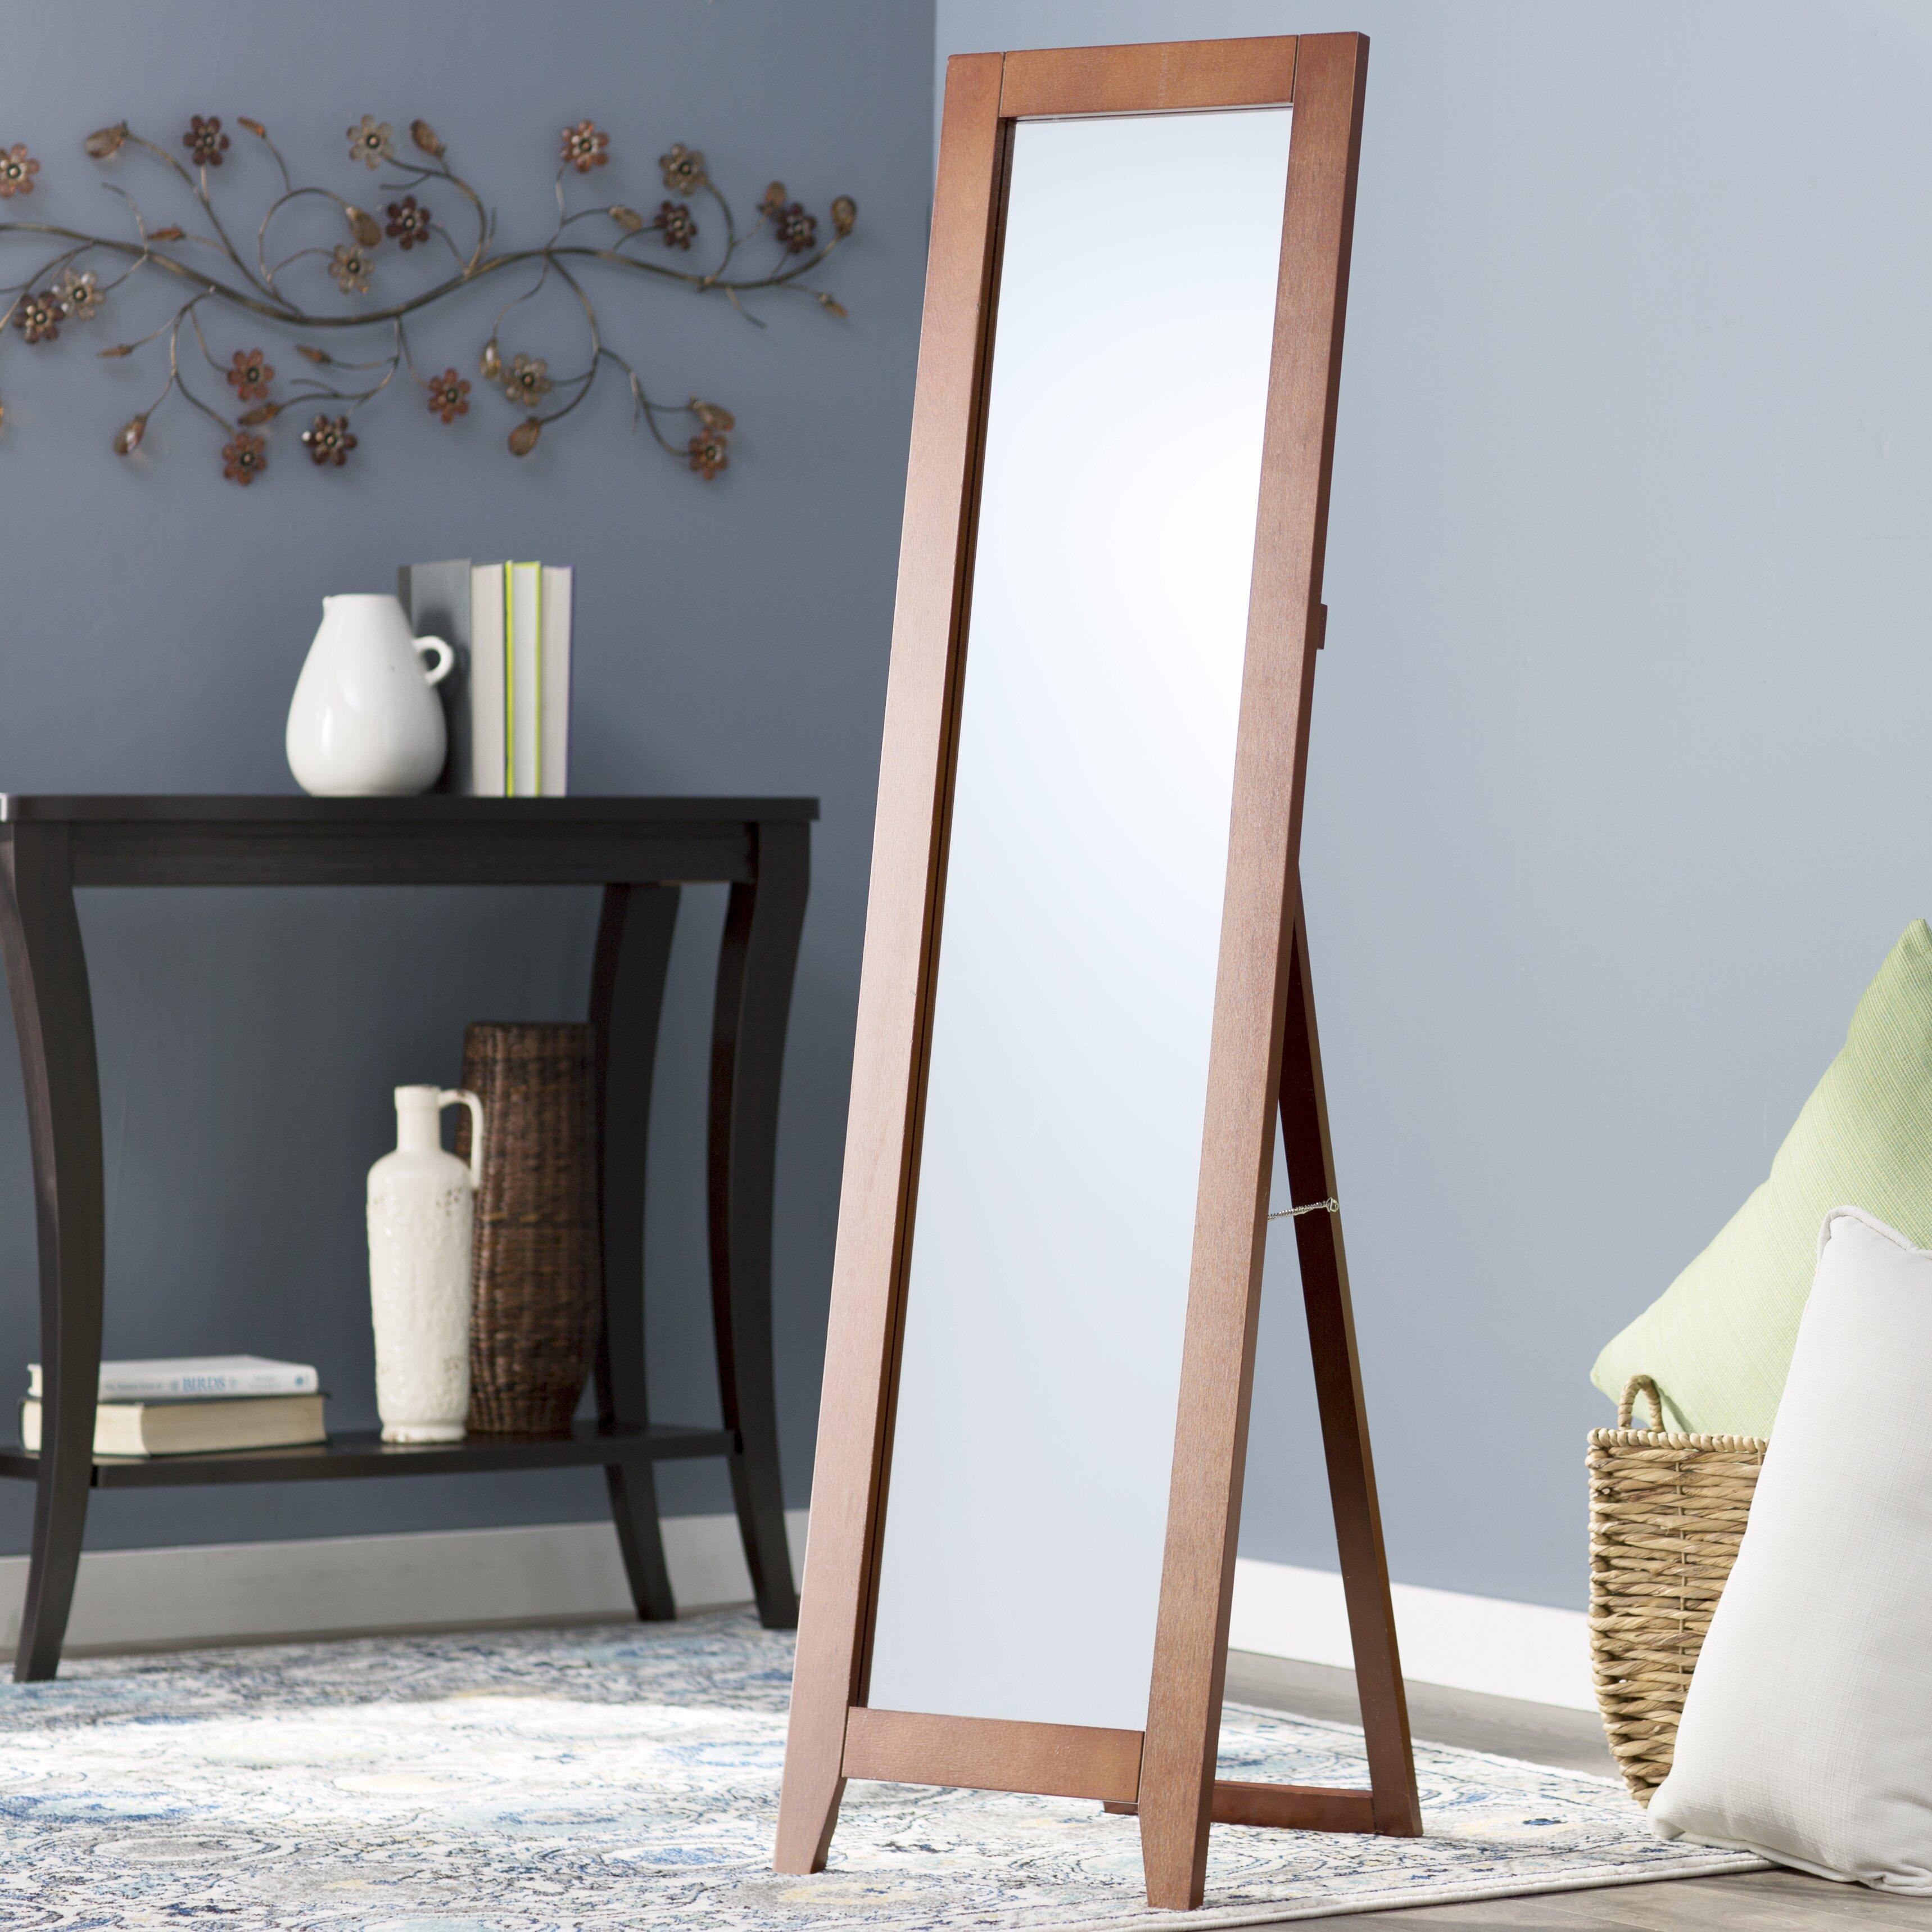 standing full length mirror wayfair supply. Black Bedroom Furniture Sets. Home Design Ideas